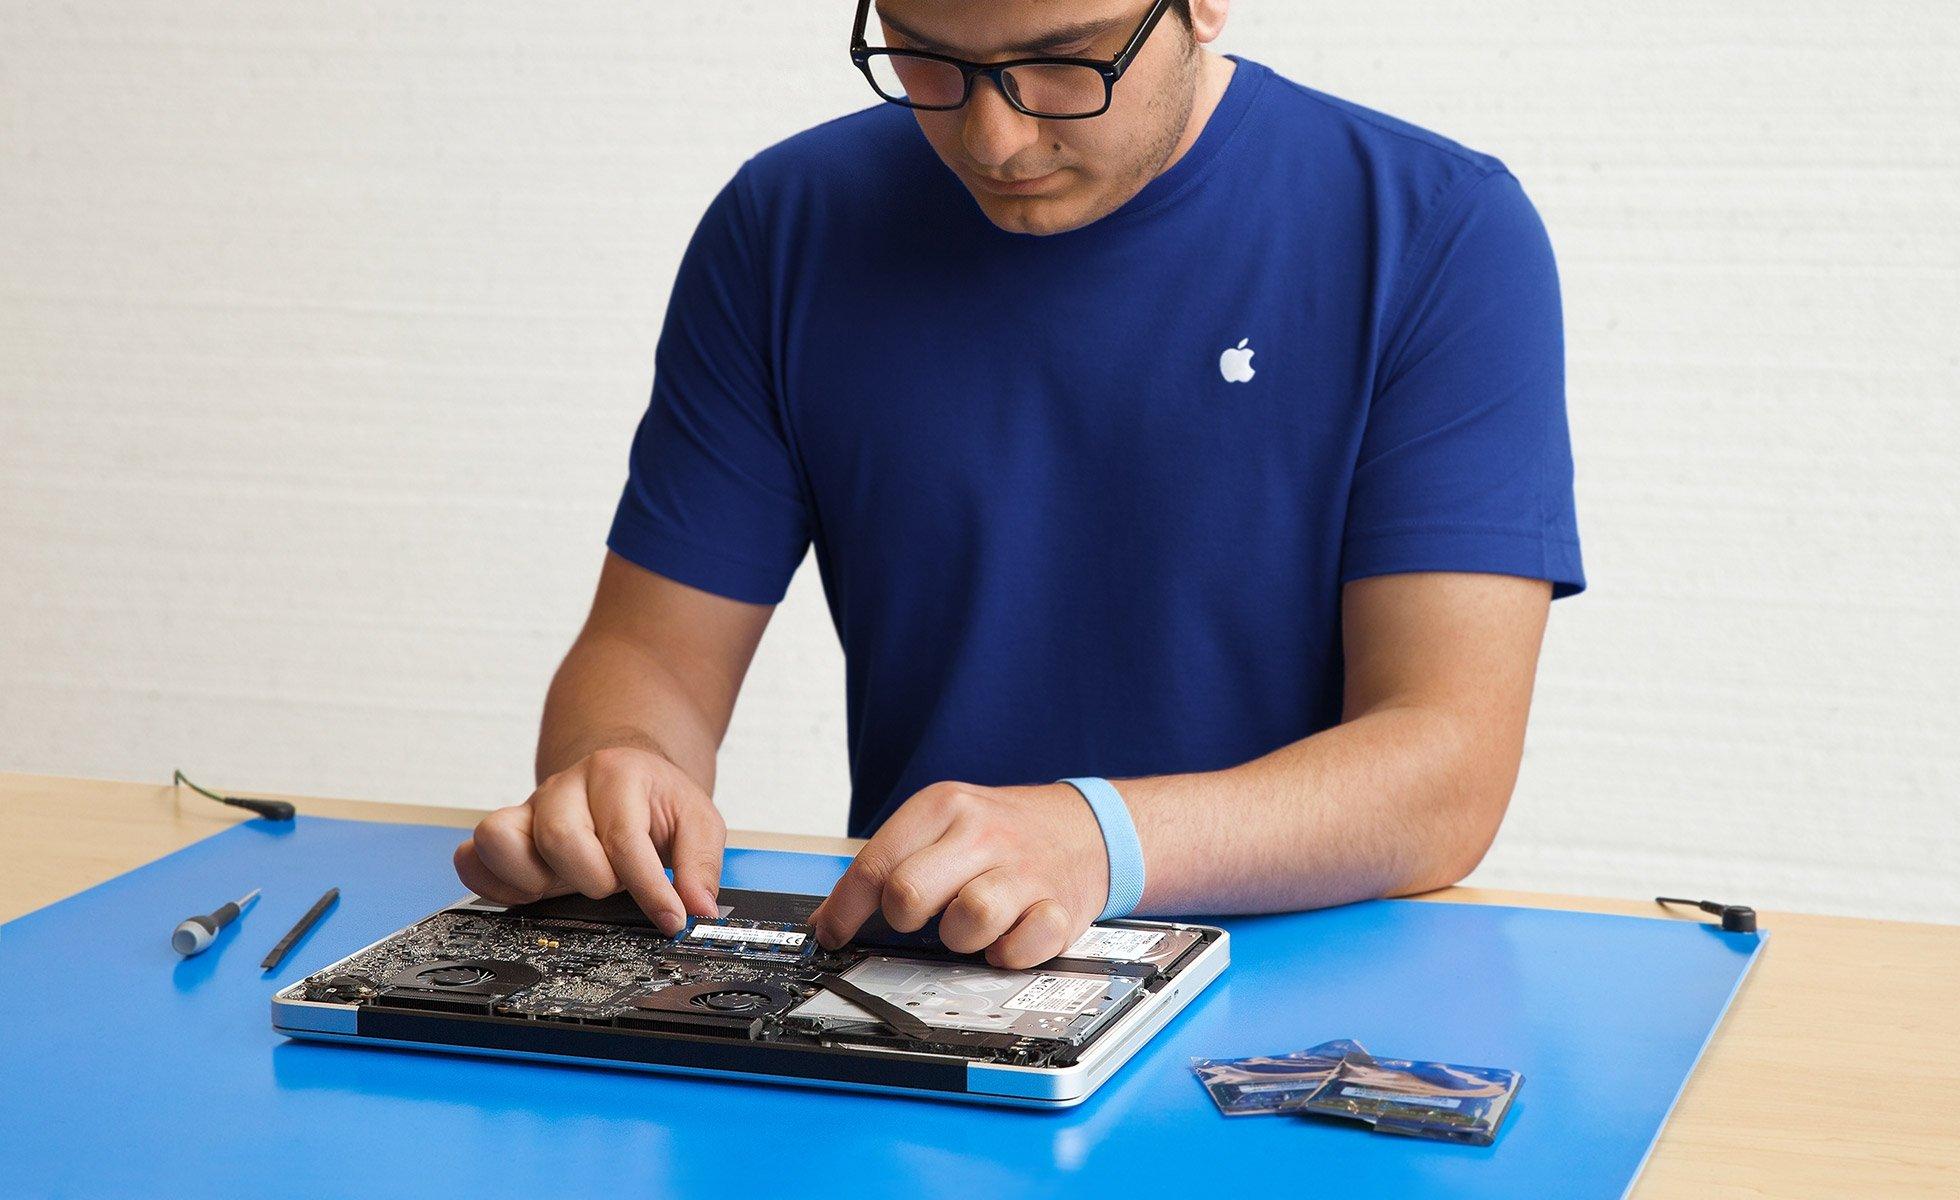 Apple reparações